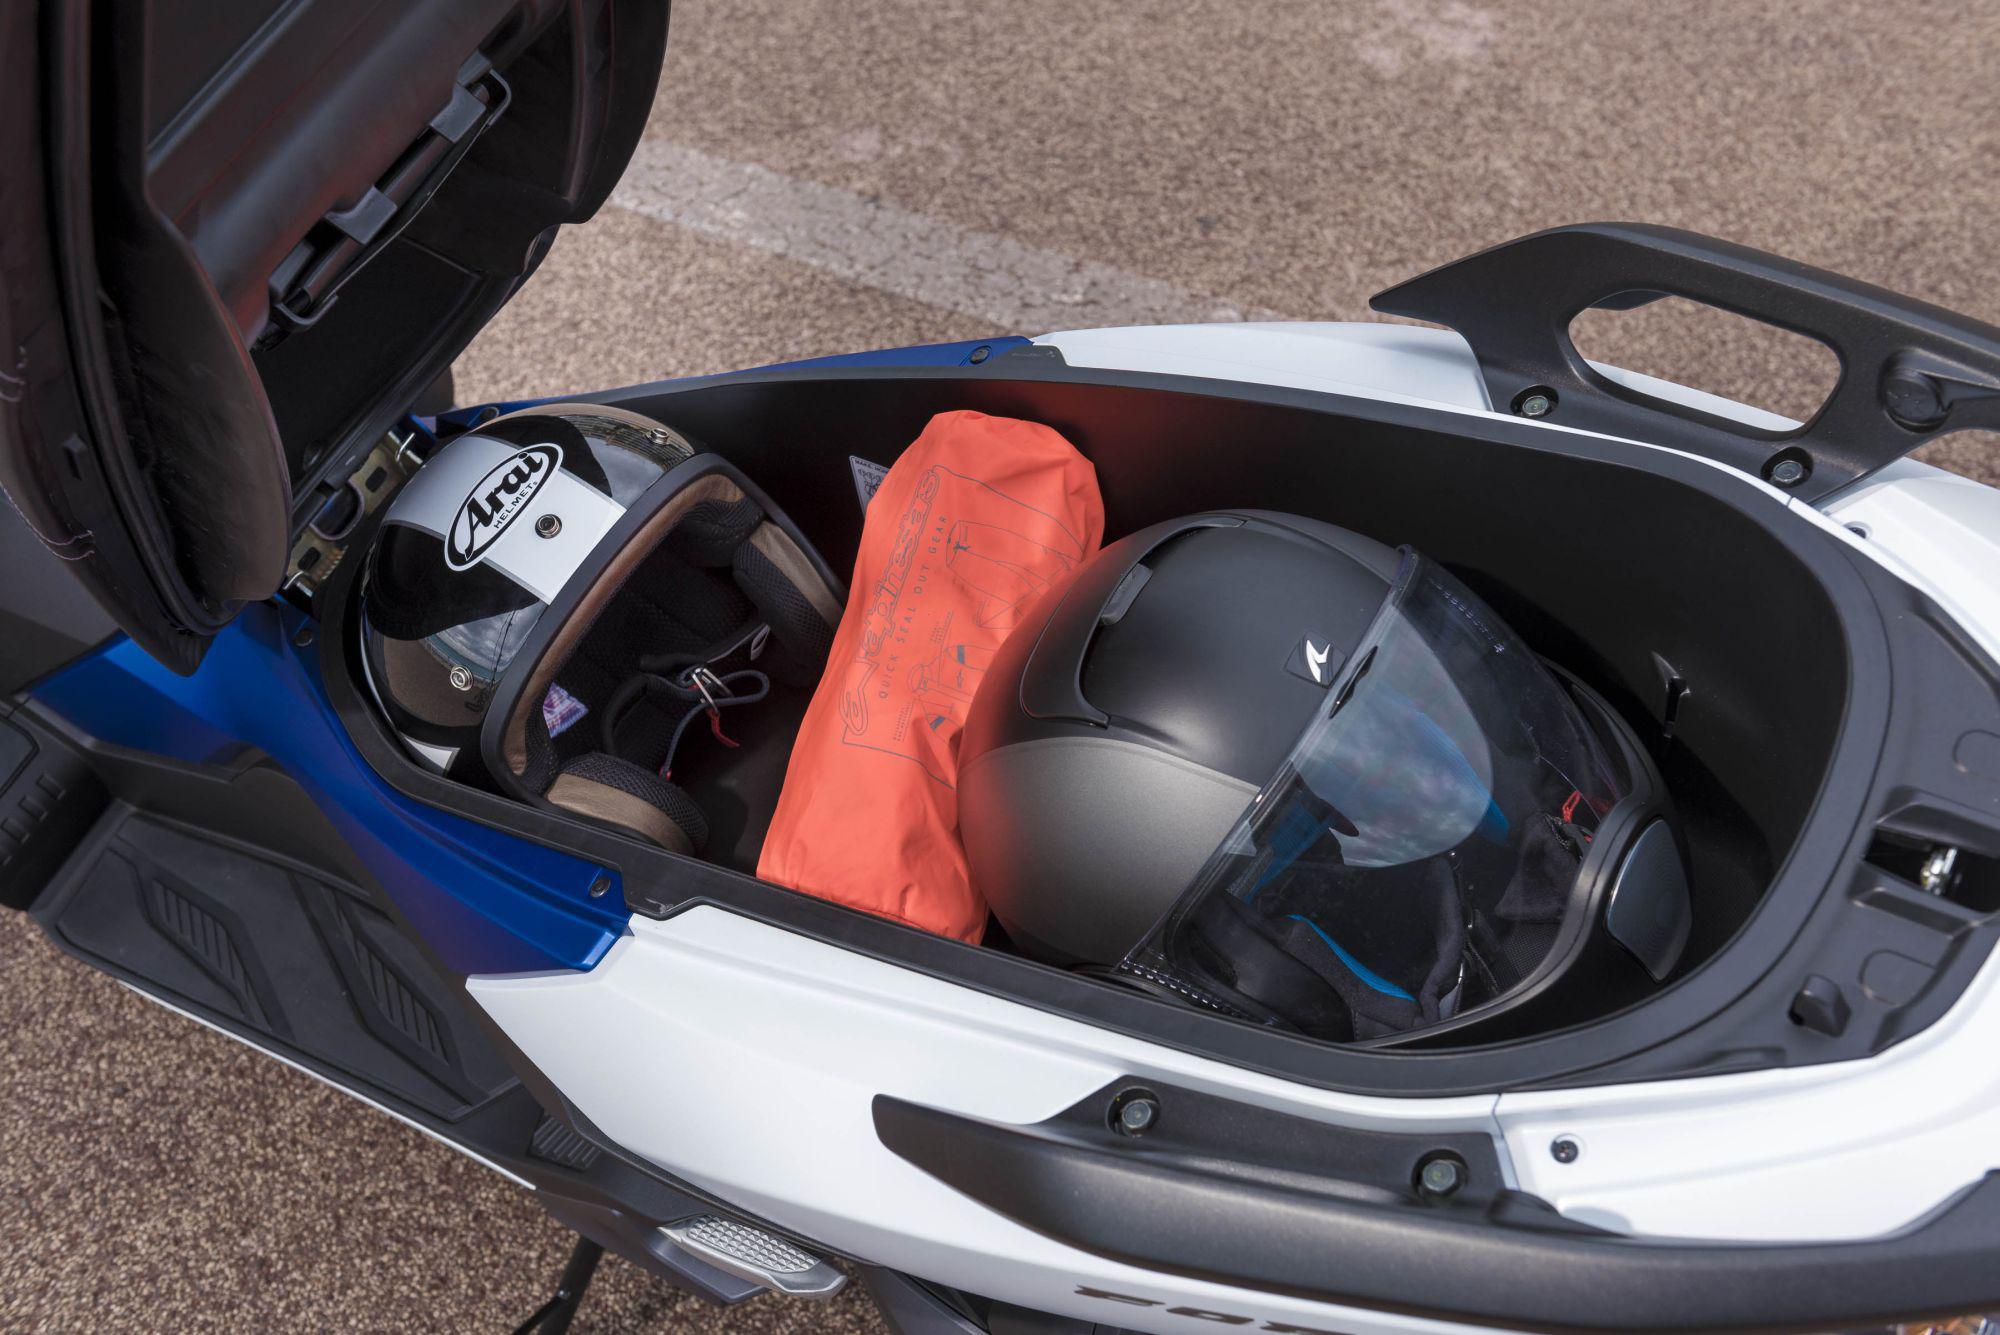 Suzuki Burgman Plastic